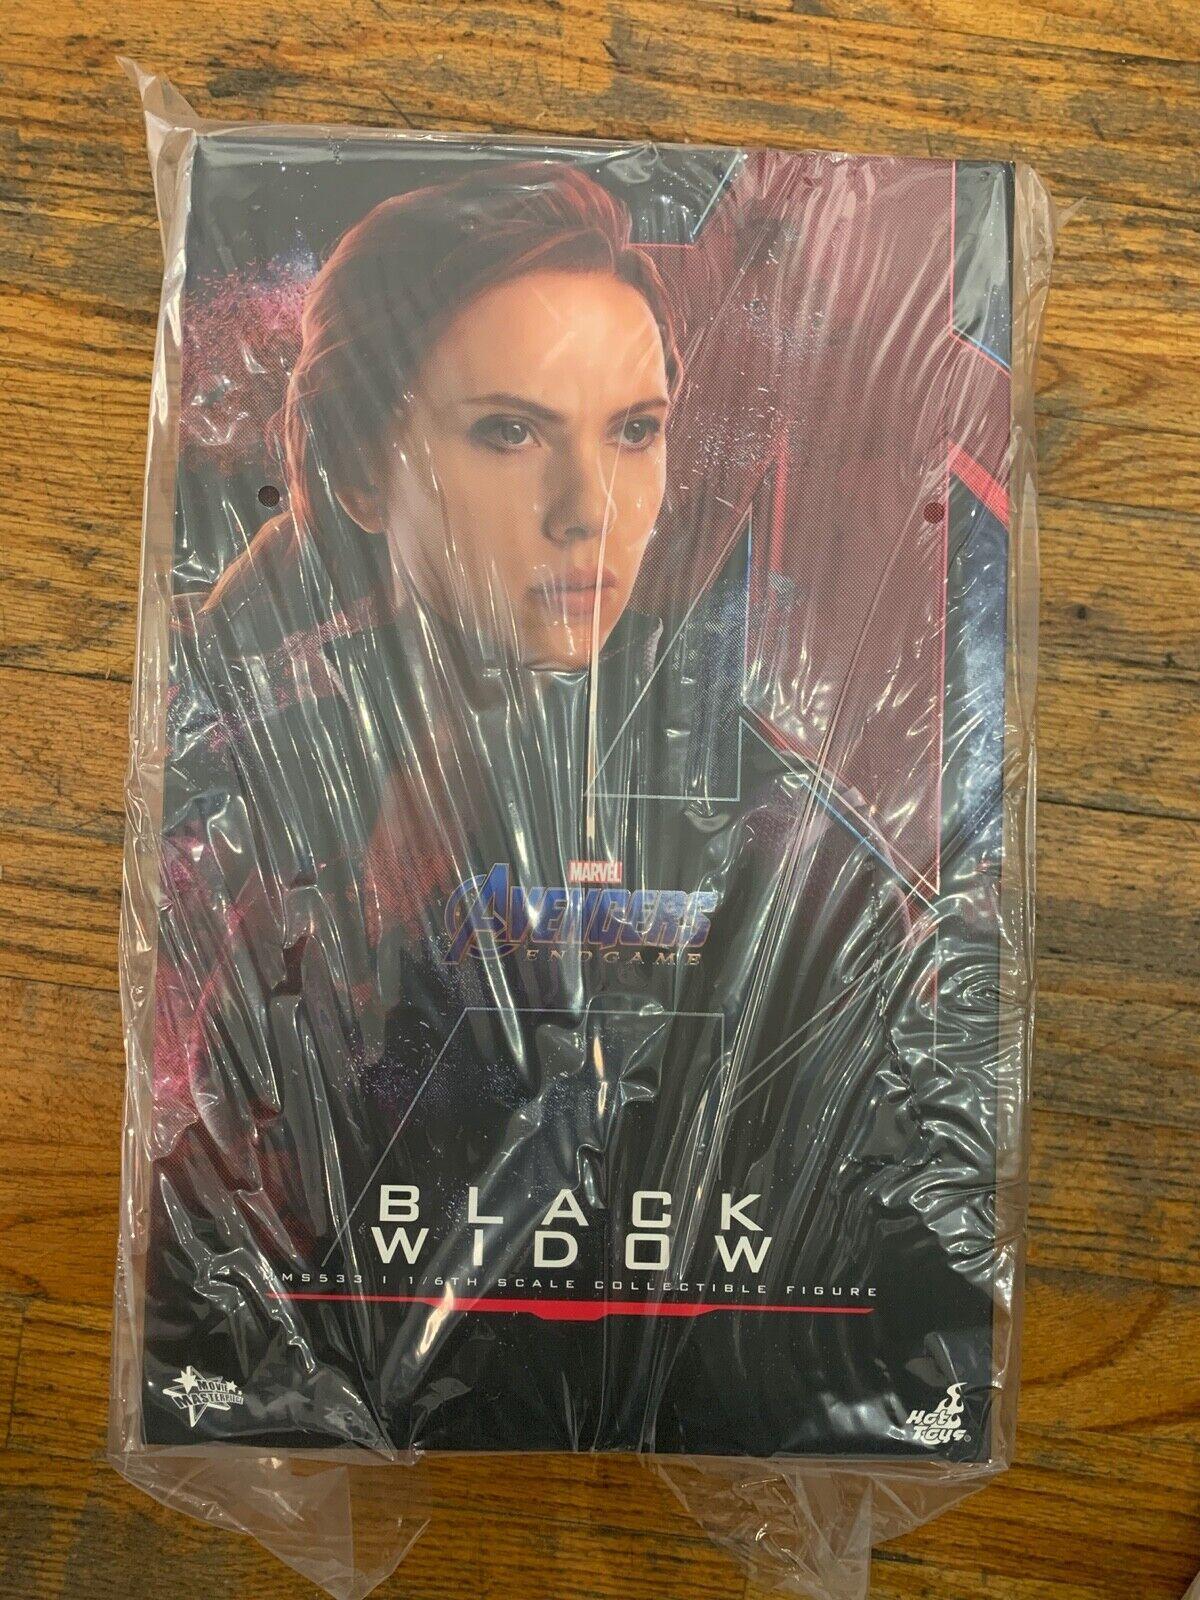 Marvel Hot Toys Black Widow MMS 533 1/6 Avengers Endgame Hawkeye NO RESERVE! on eBay thumbnail